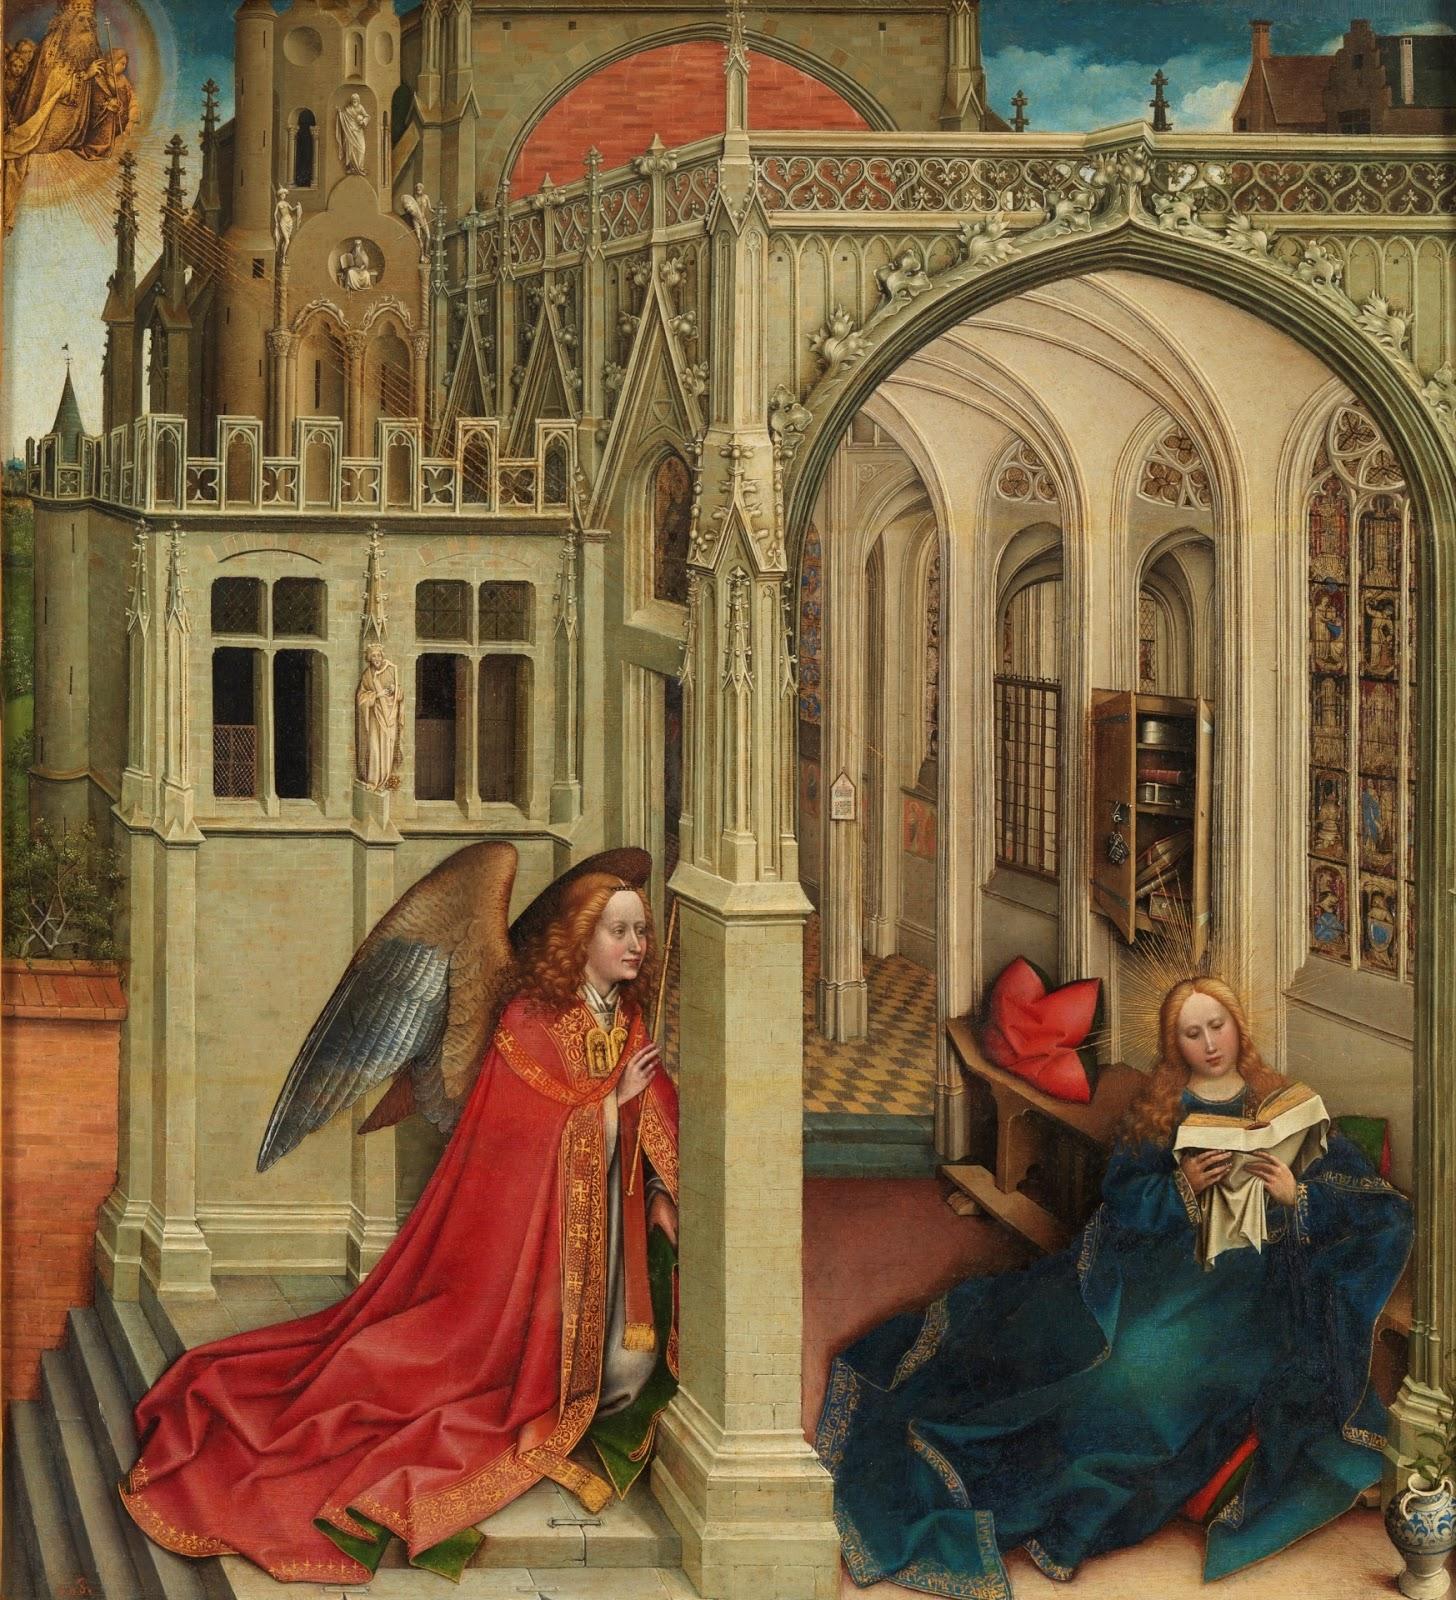 campin Annonciation Prado 1420 - 1425